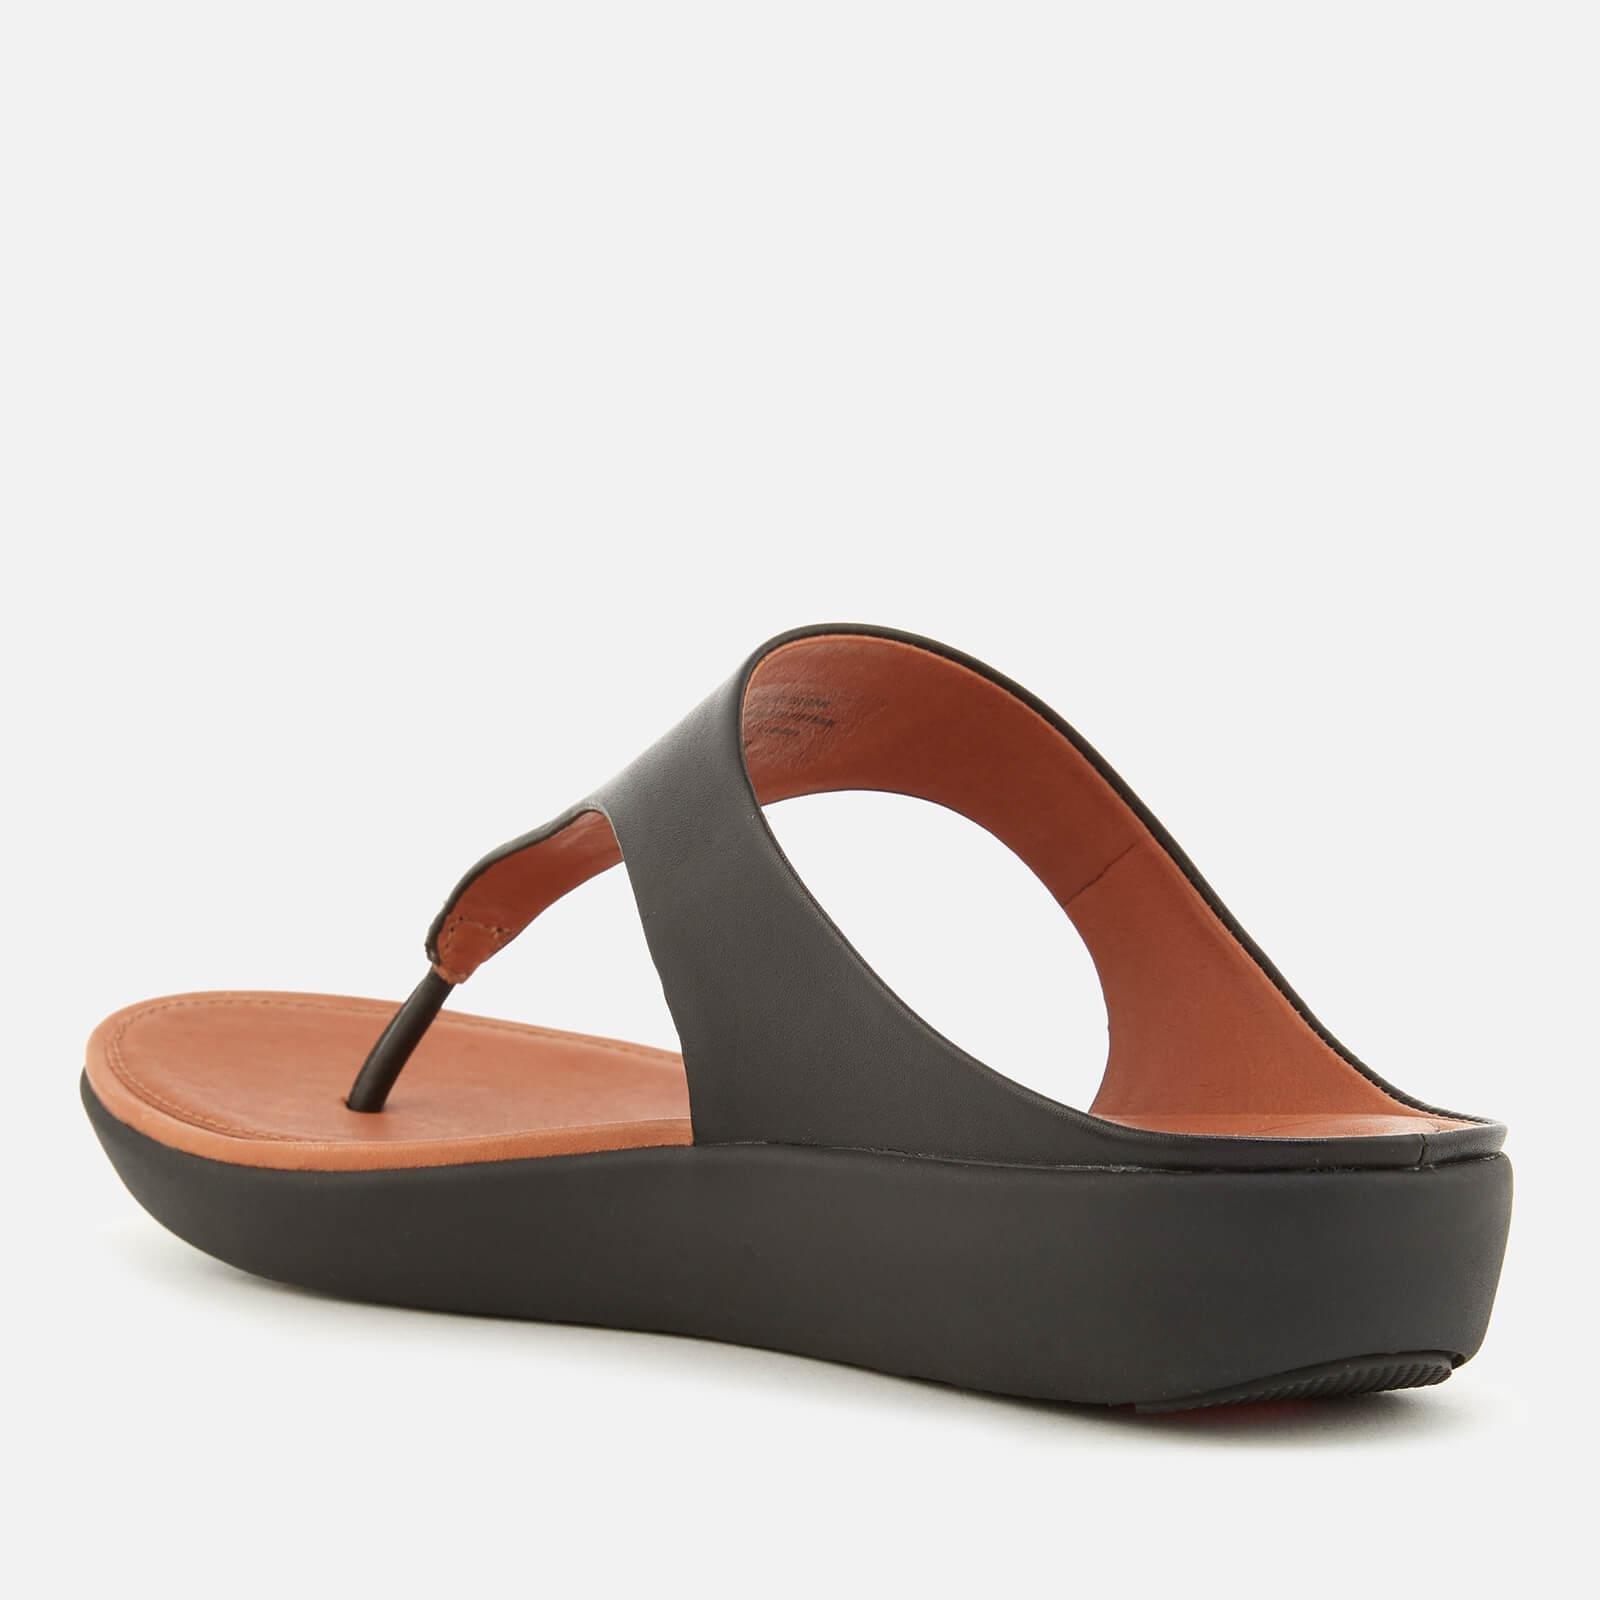 a64855de8c8f3b Fitflop - Black Banda Ii Leather Toe Post Sandals - Lyst. View fullscreen